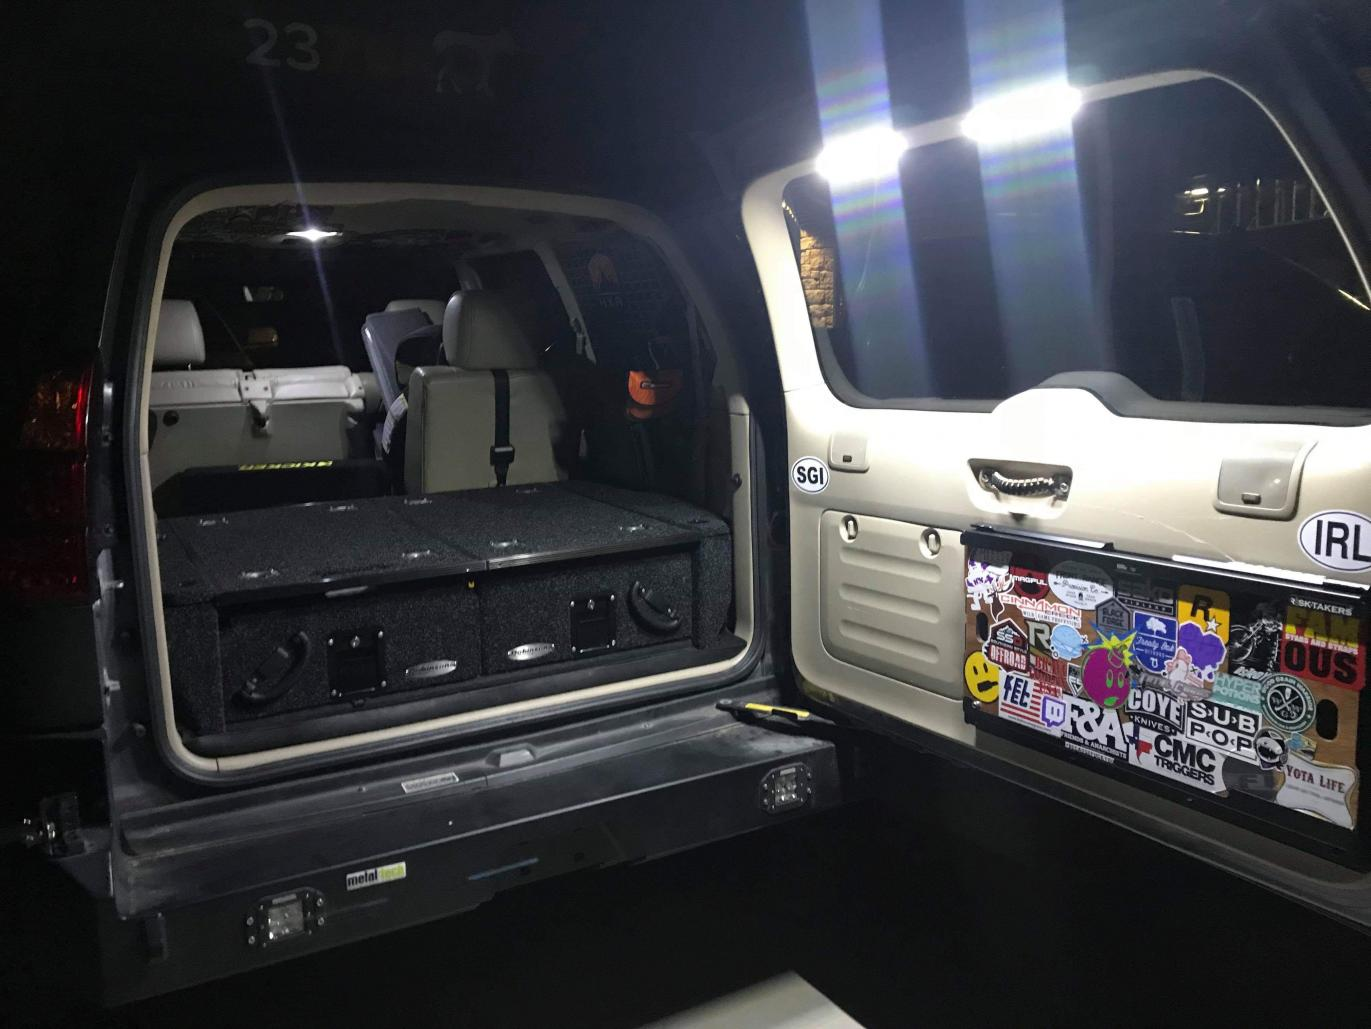 Dobinsons Rear Drawer System for Lexus GX470-lexus-gx470-wings-jpg